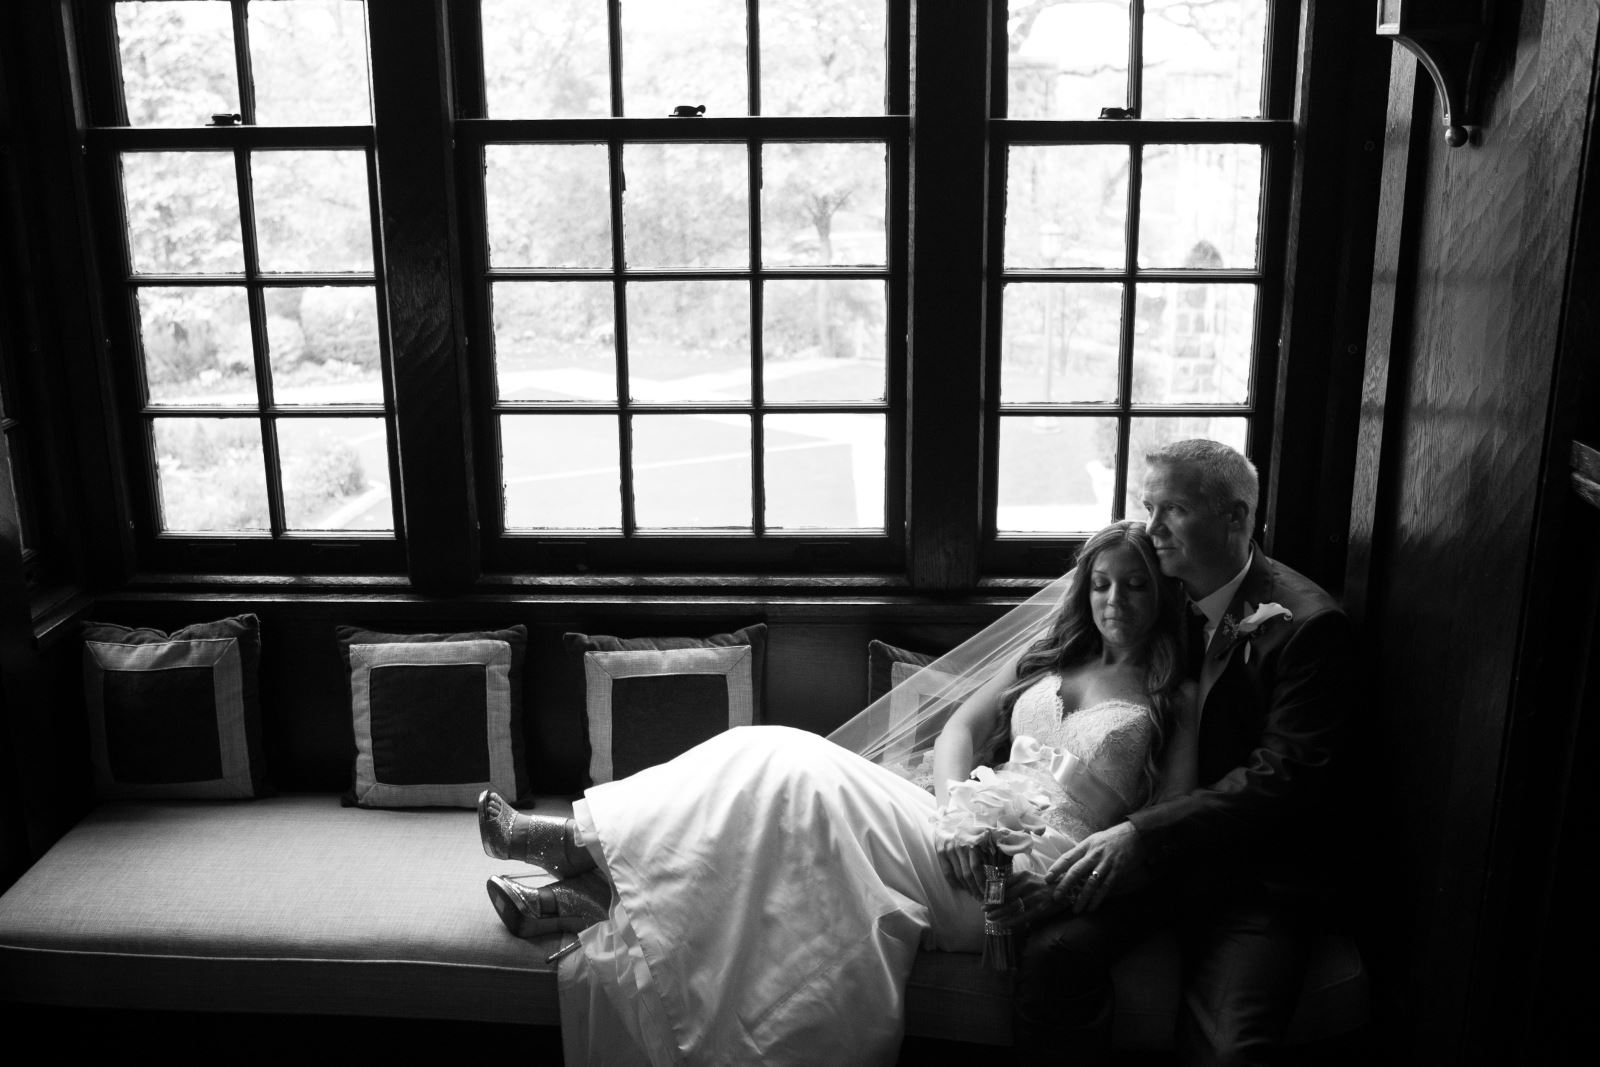 Rosibel's Wedding Dress Preservation in New Jersey